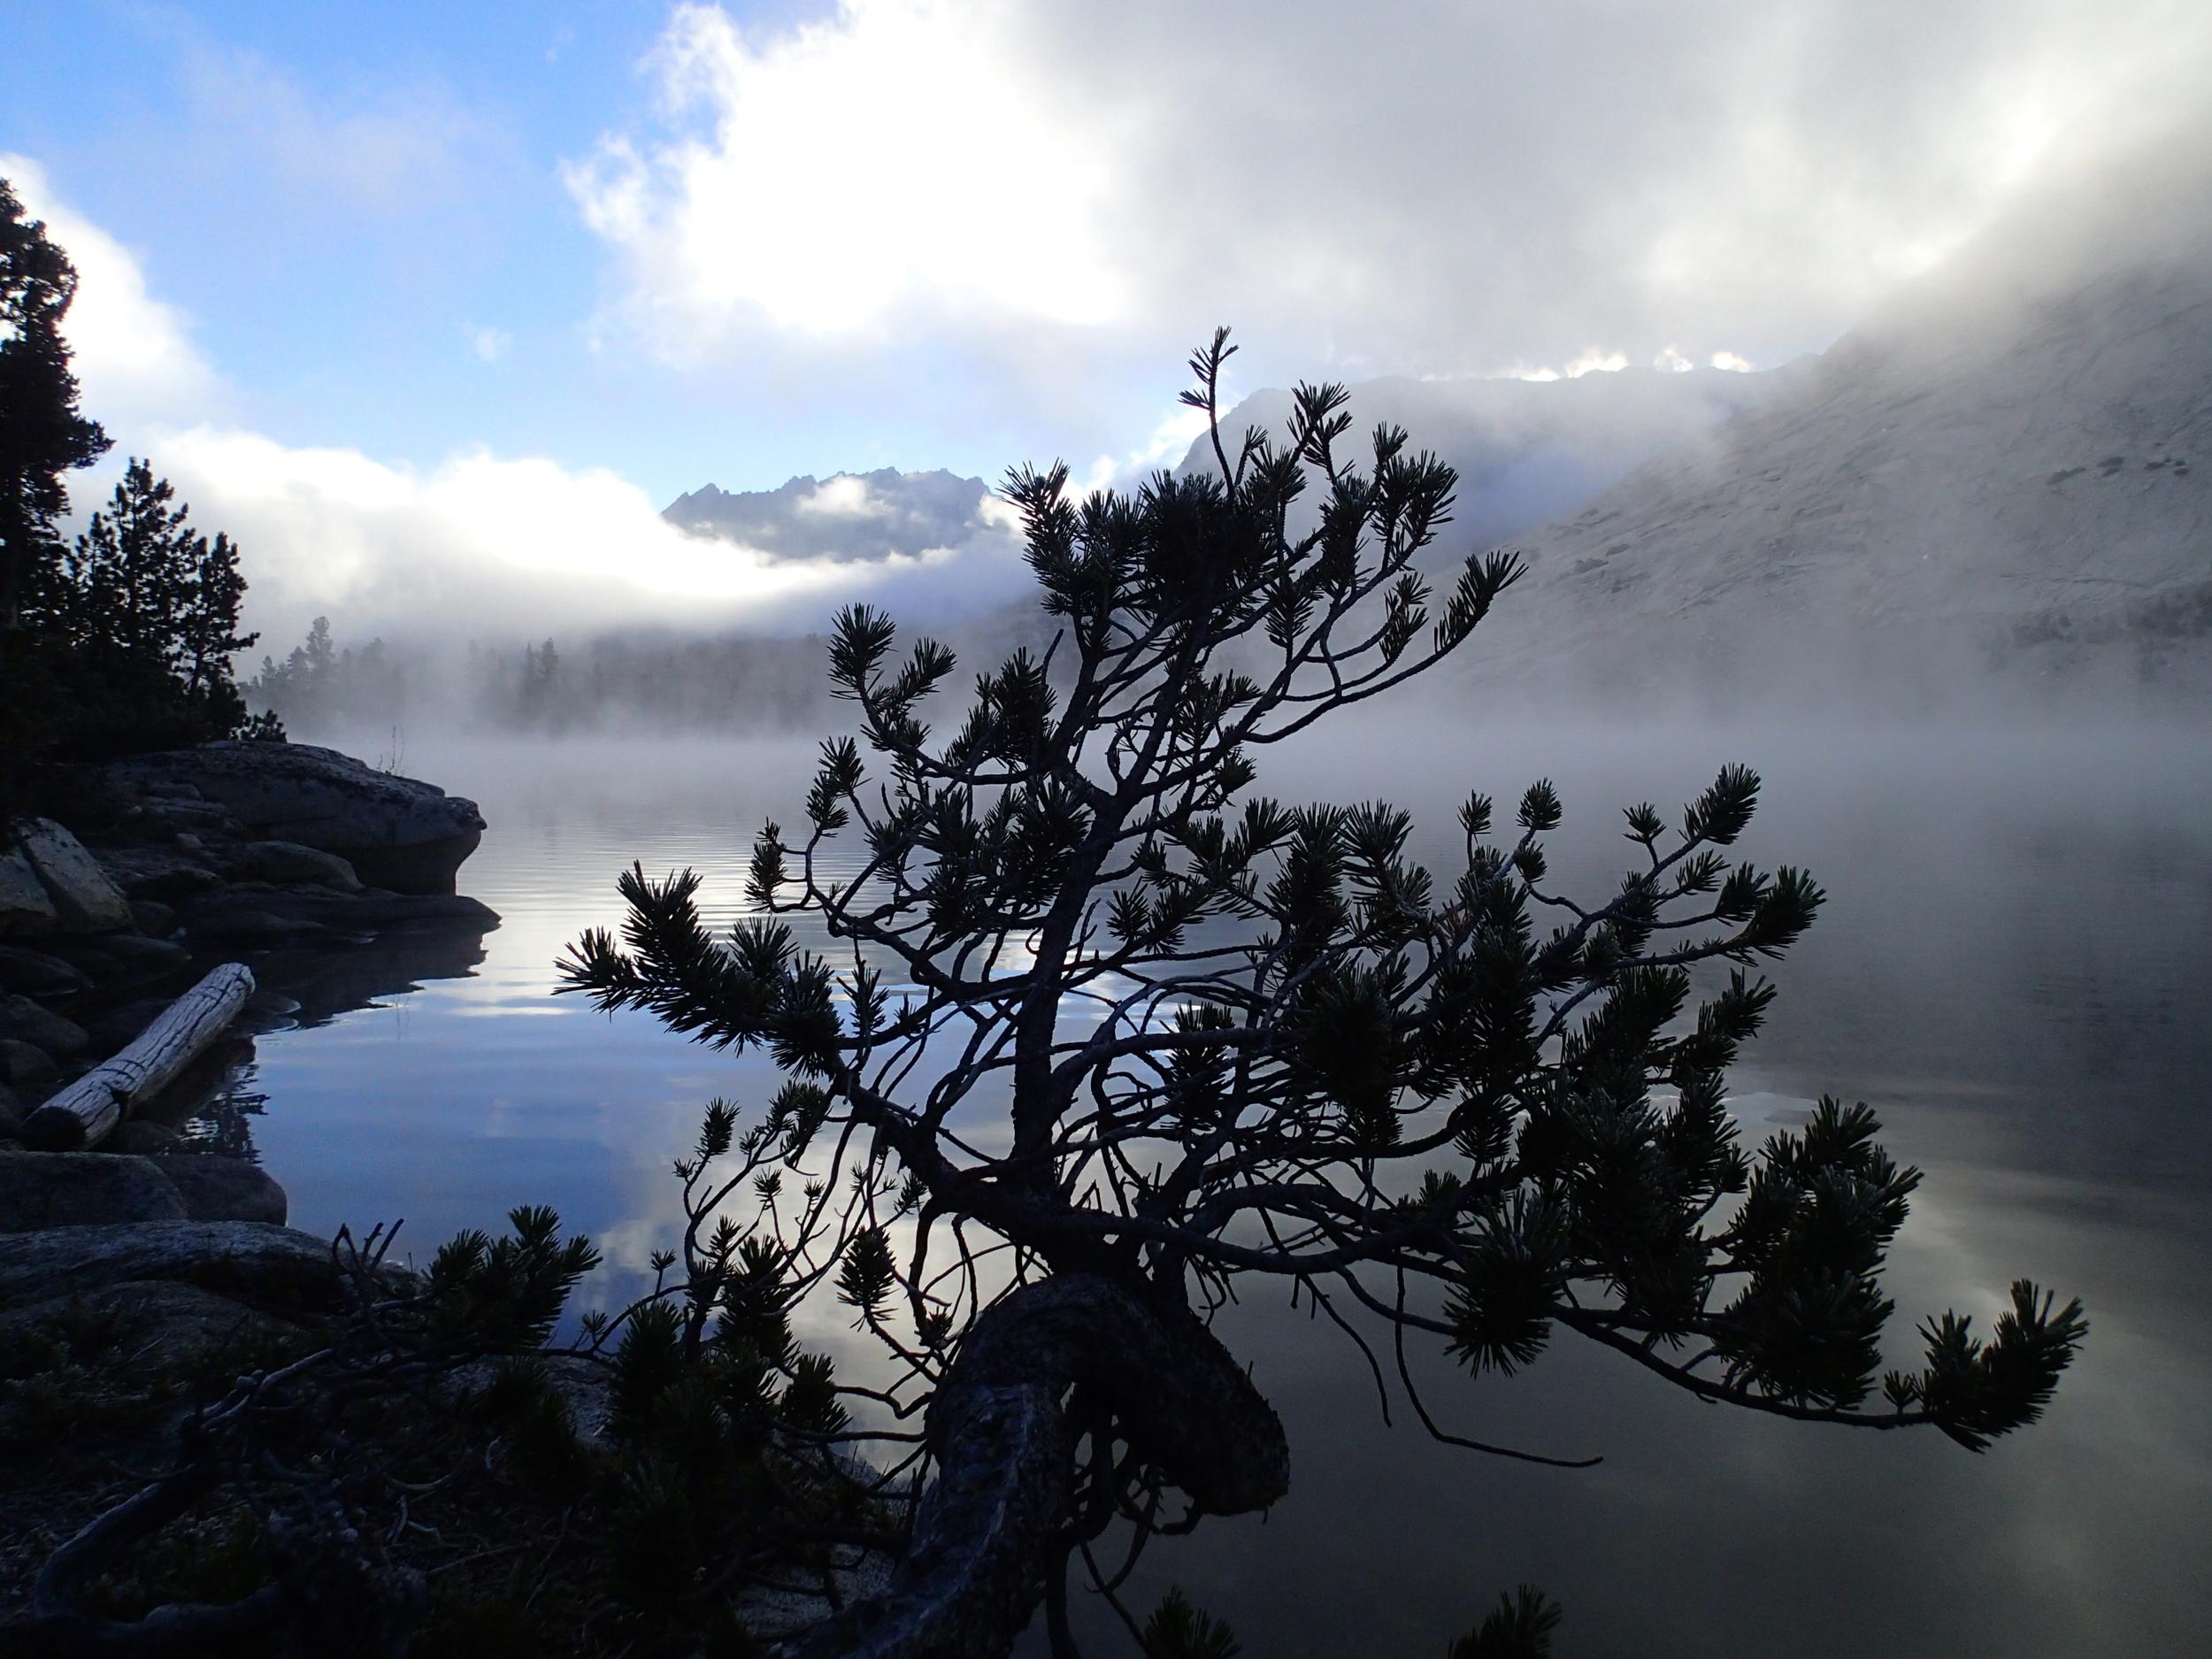 Steamfog on Bench Lake